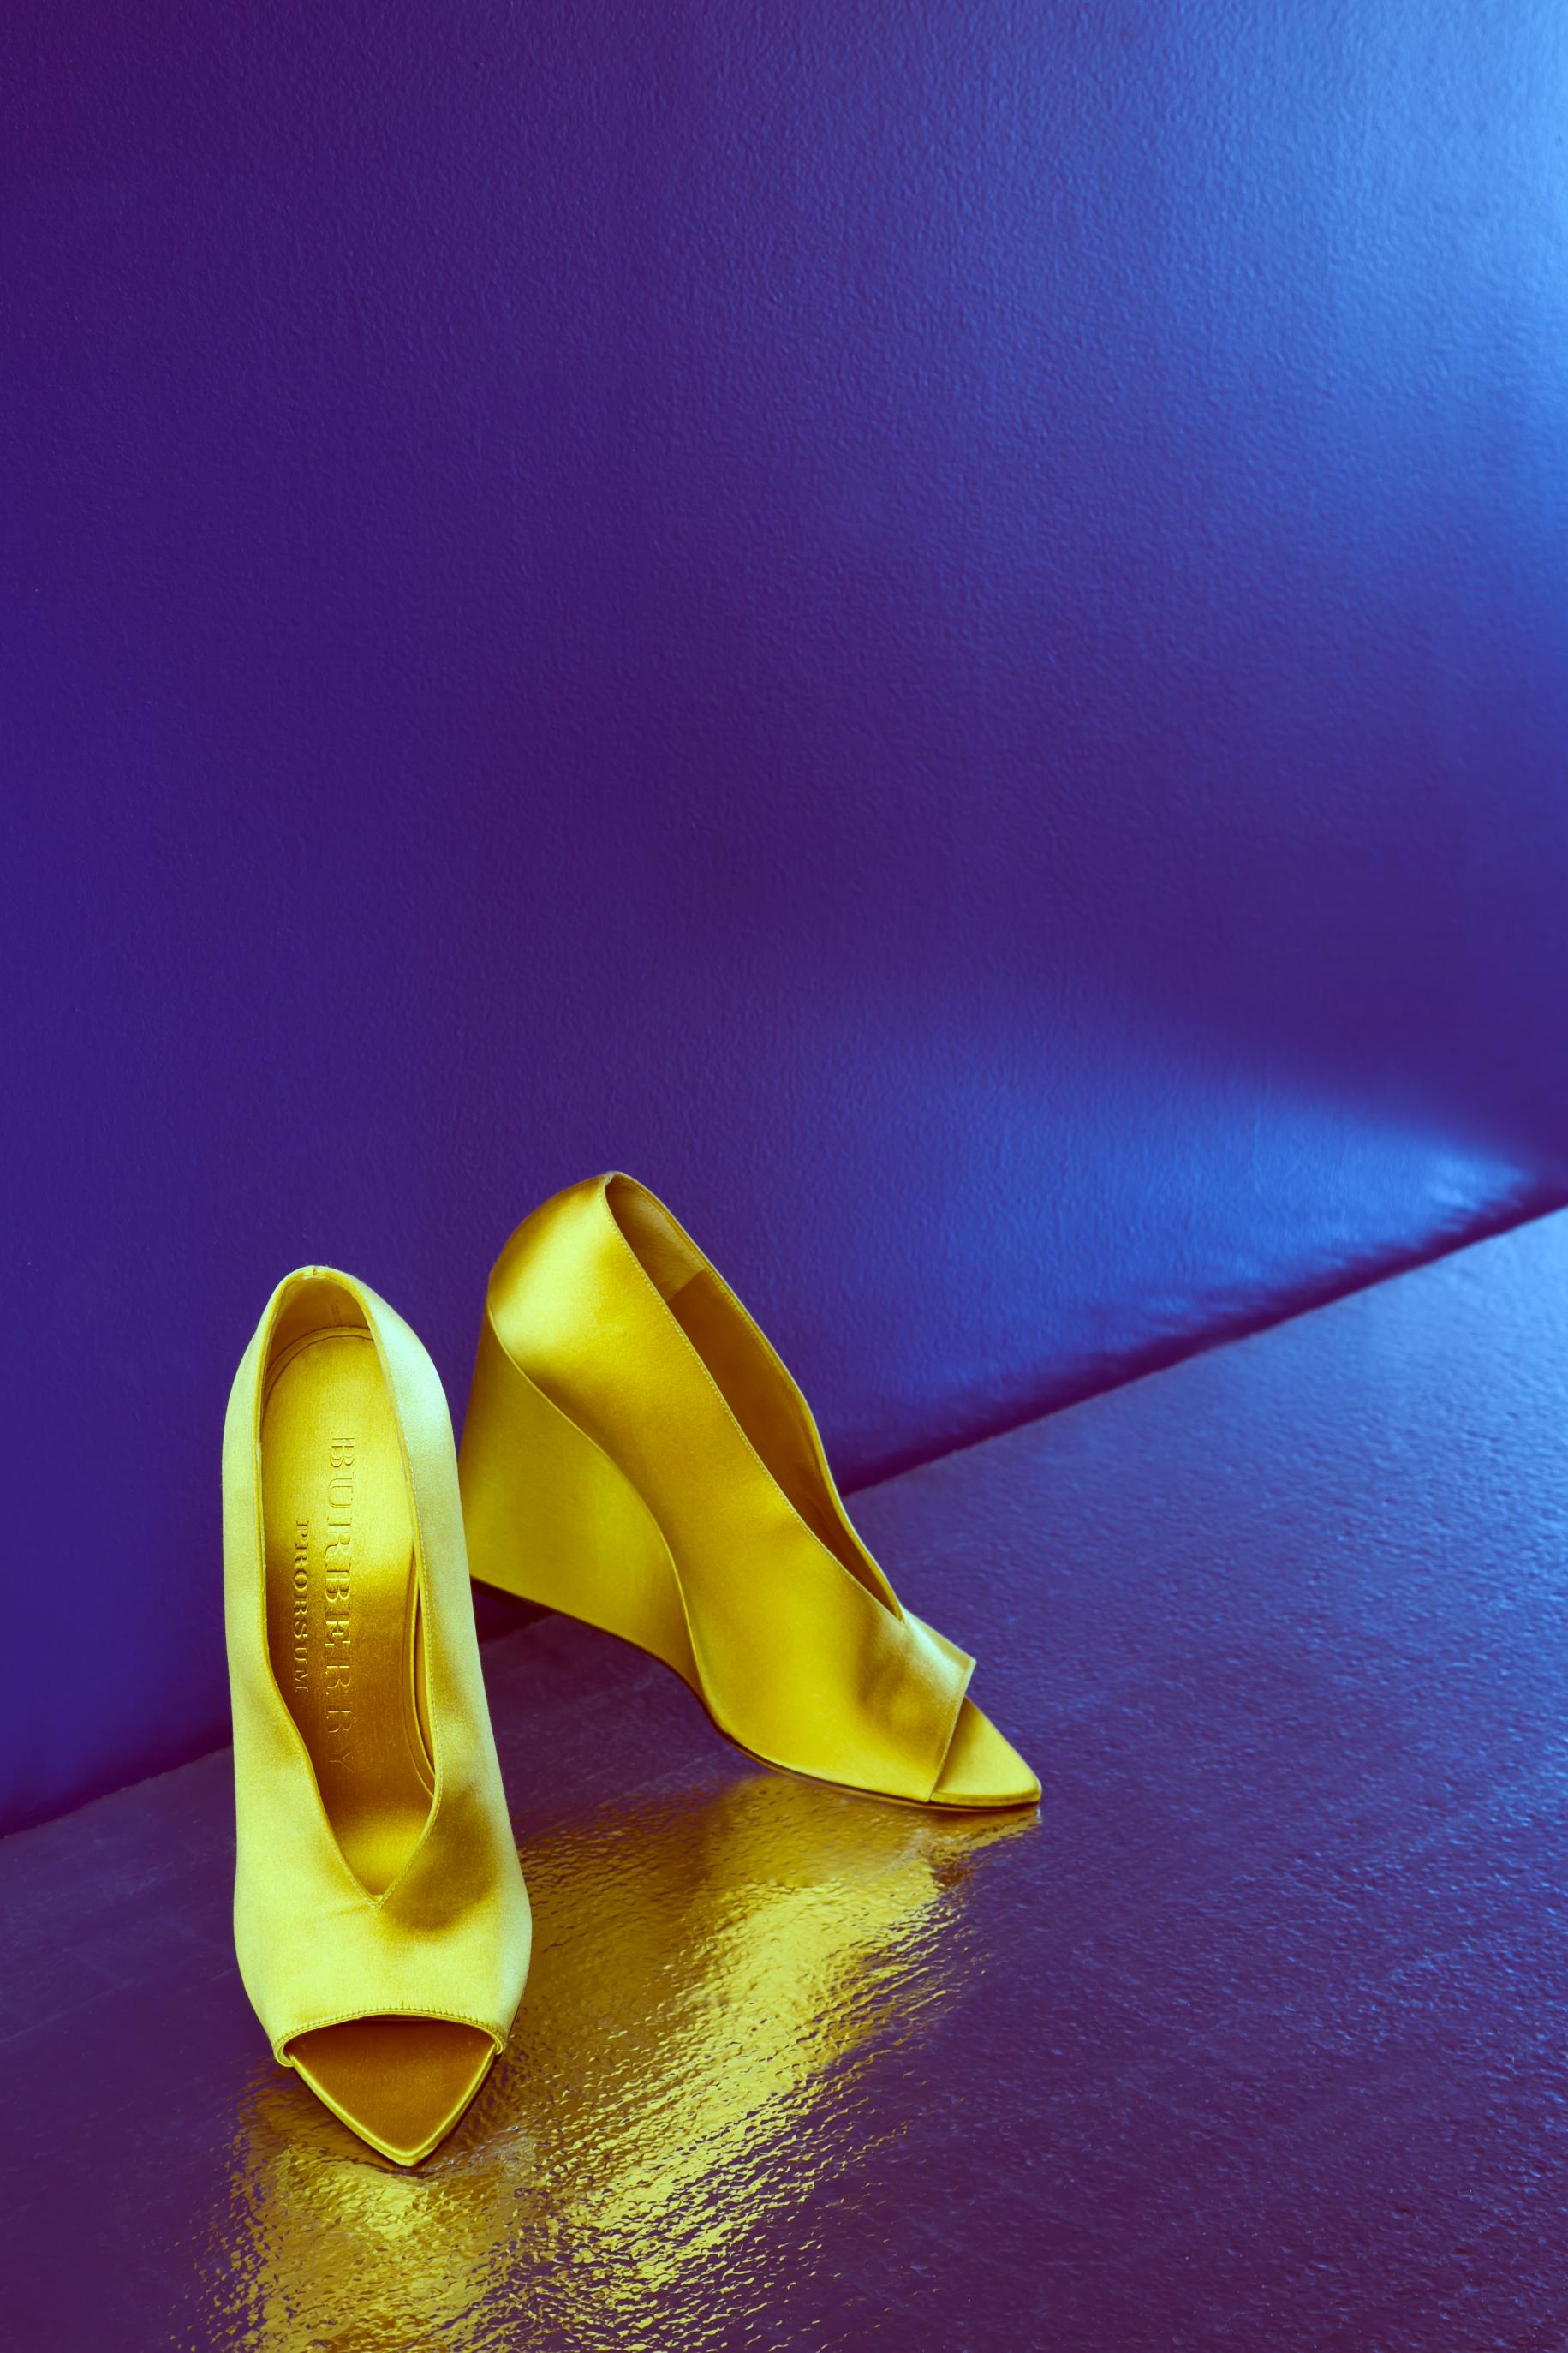 ©Haley_Blavka_Photography_2014_Product-1-2.jpg